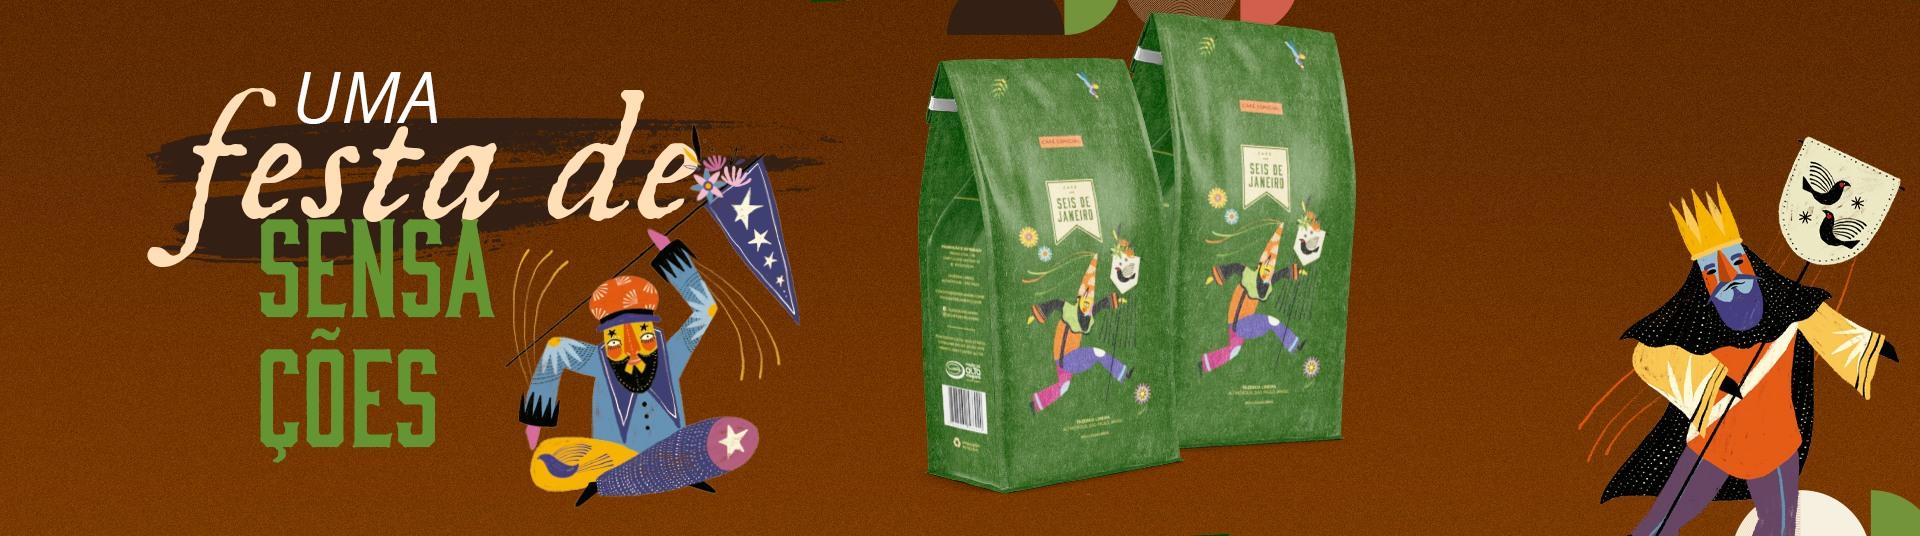 full banner produto/café